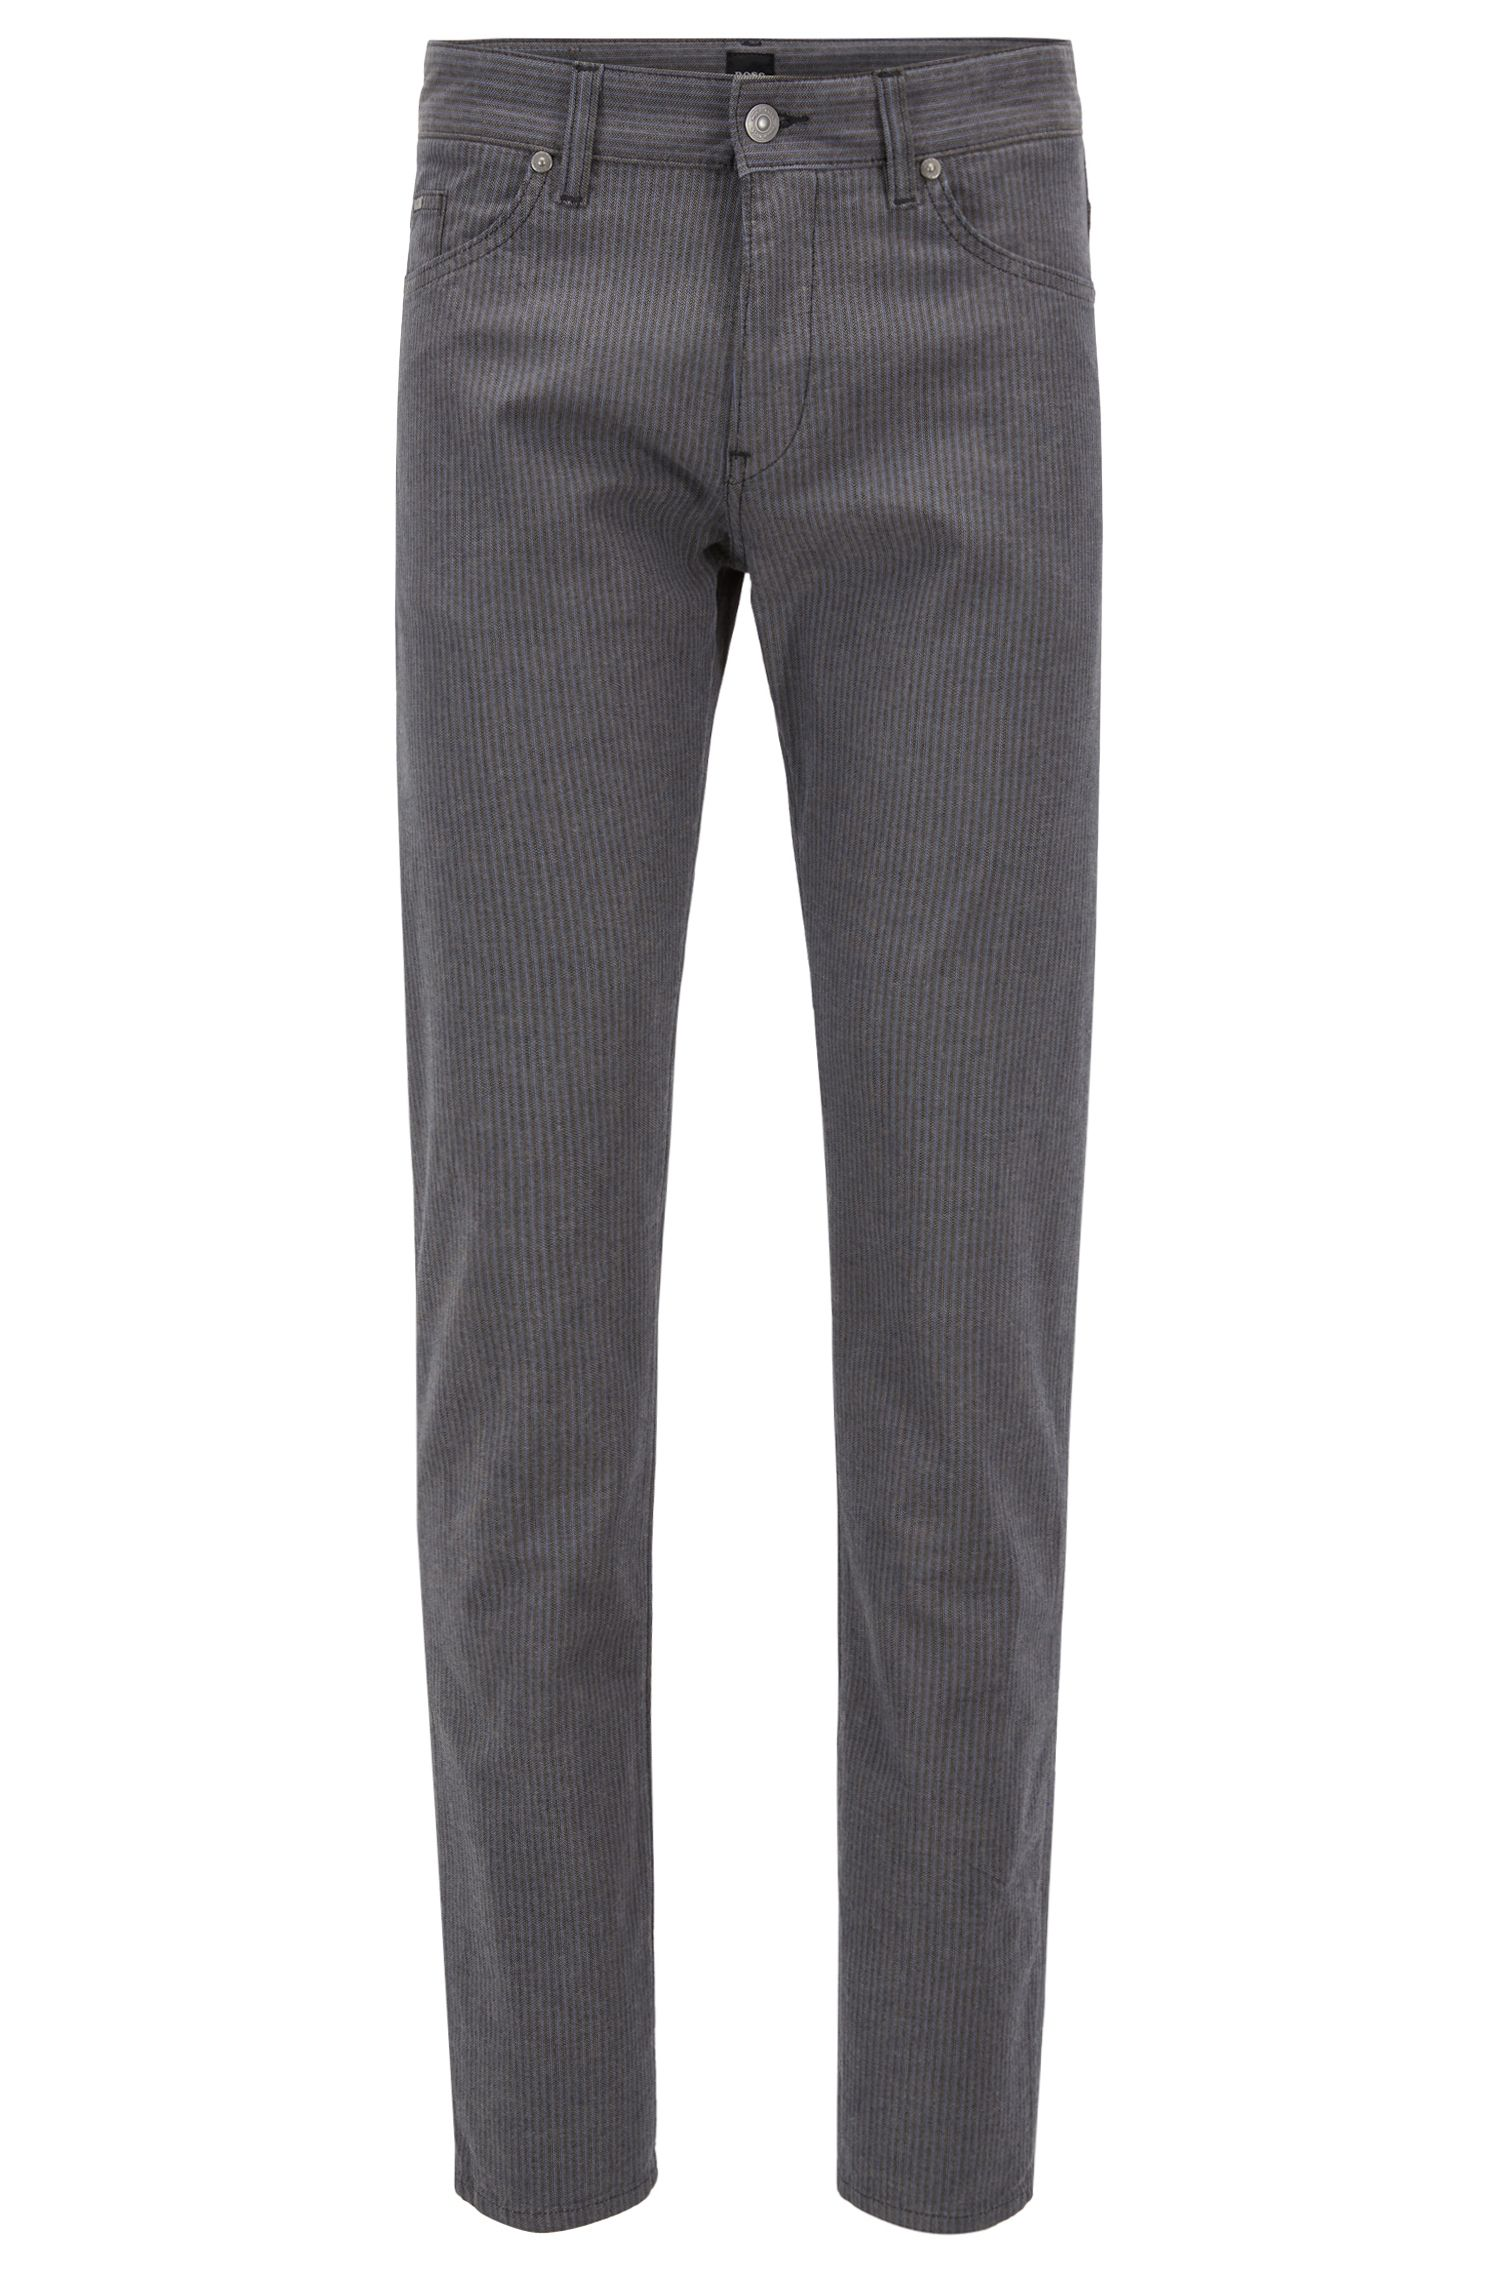 Slim-fit jeans in brushed stretch-cotton herringbone, Grey